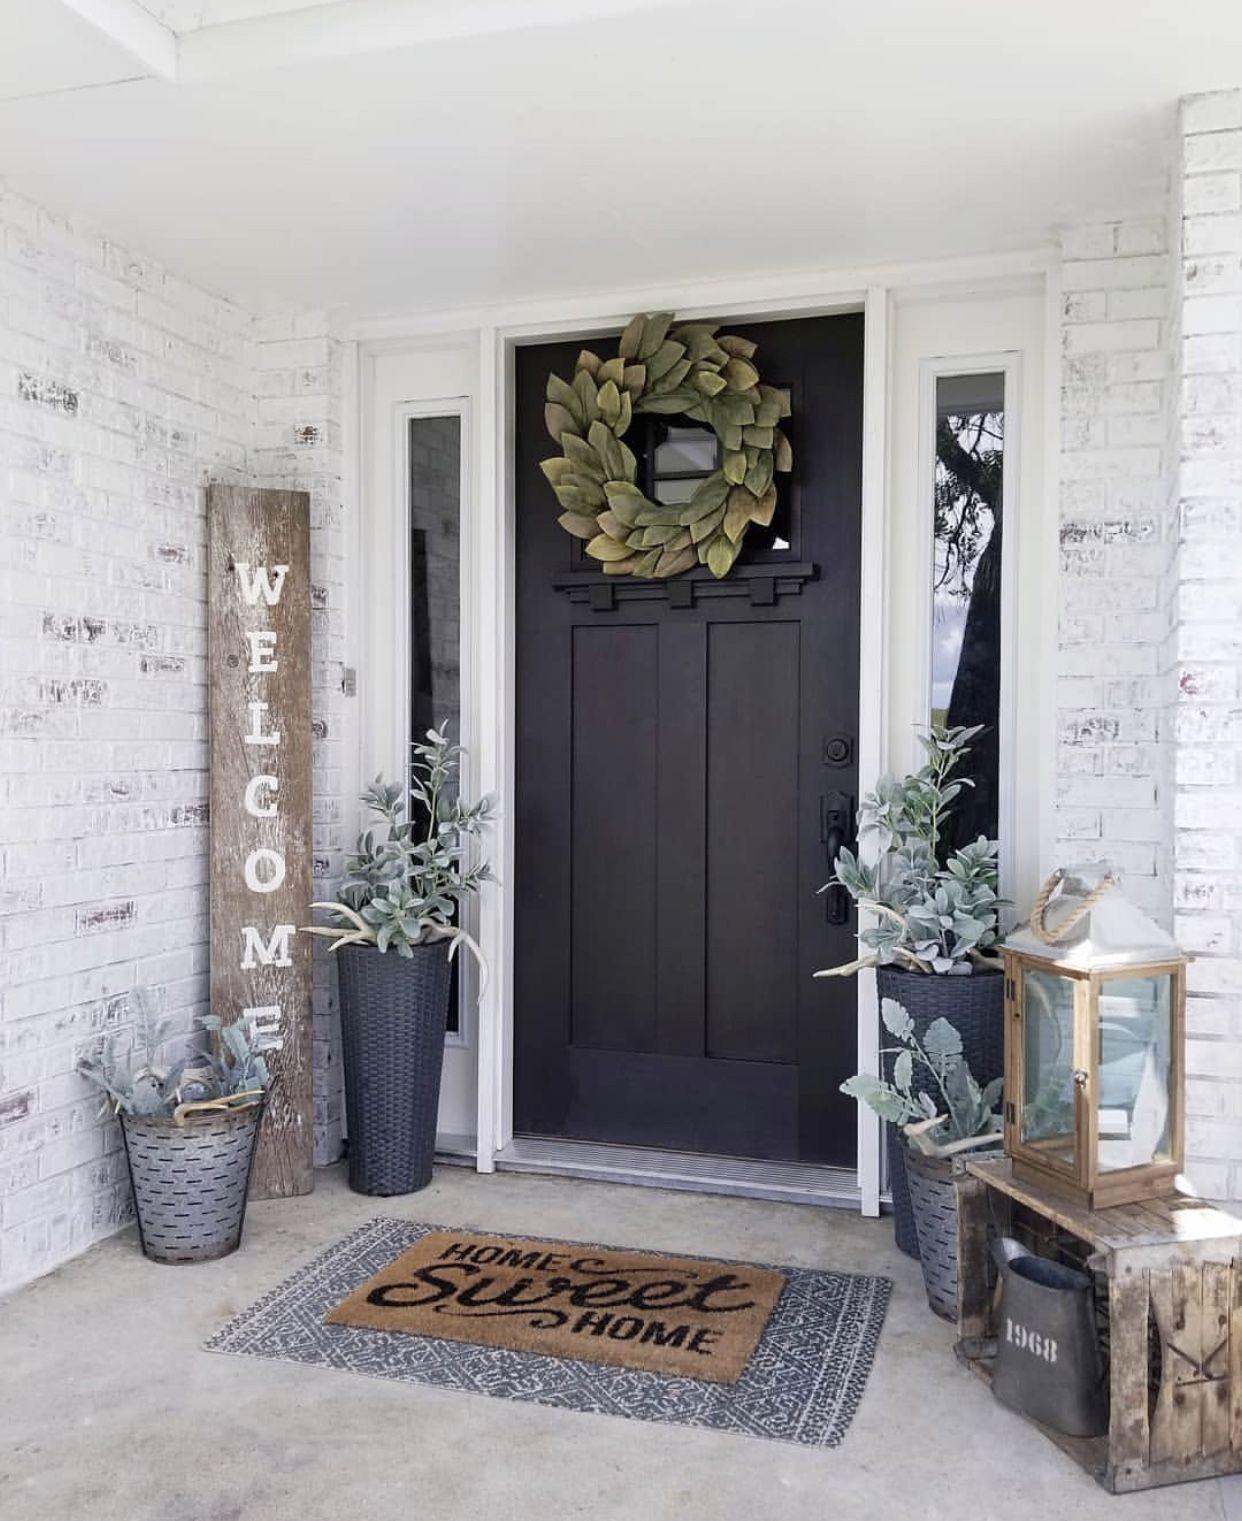 Mew Black Front Door Modern Farmhouse Decor Front Porch Decorating Rustic Porch